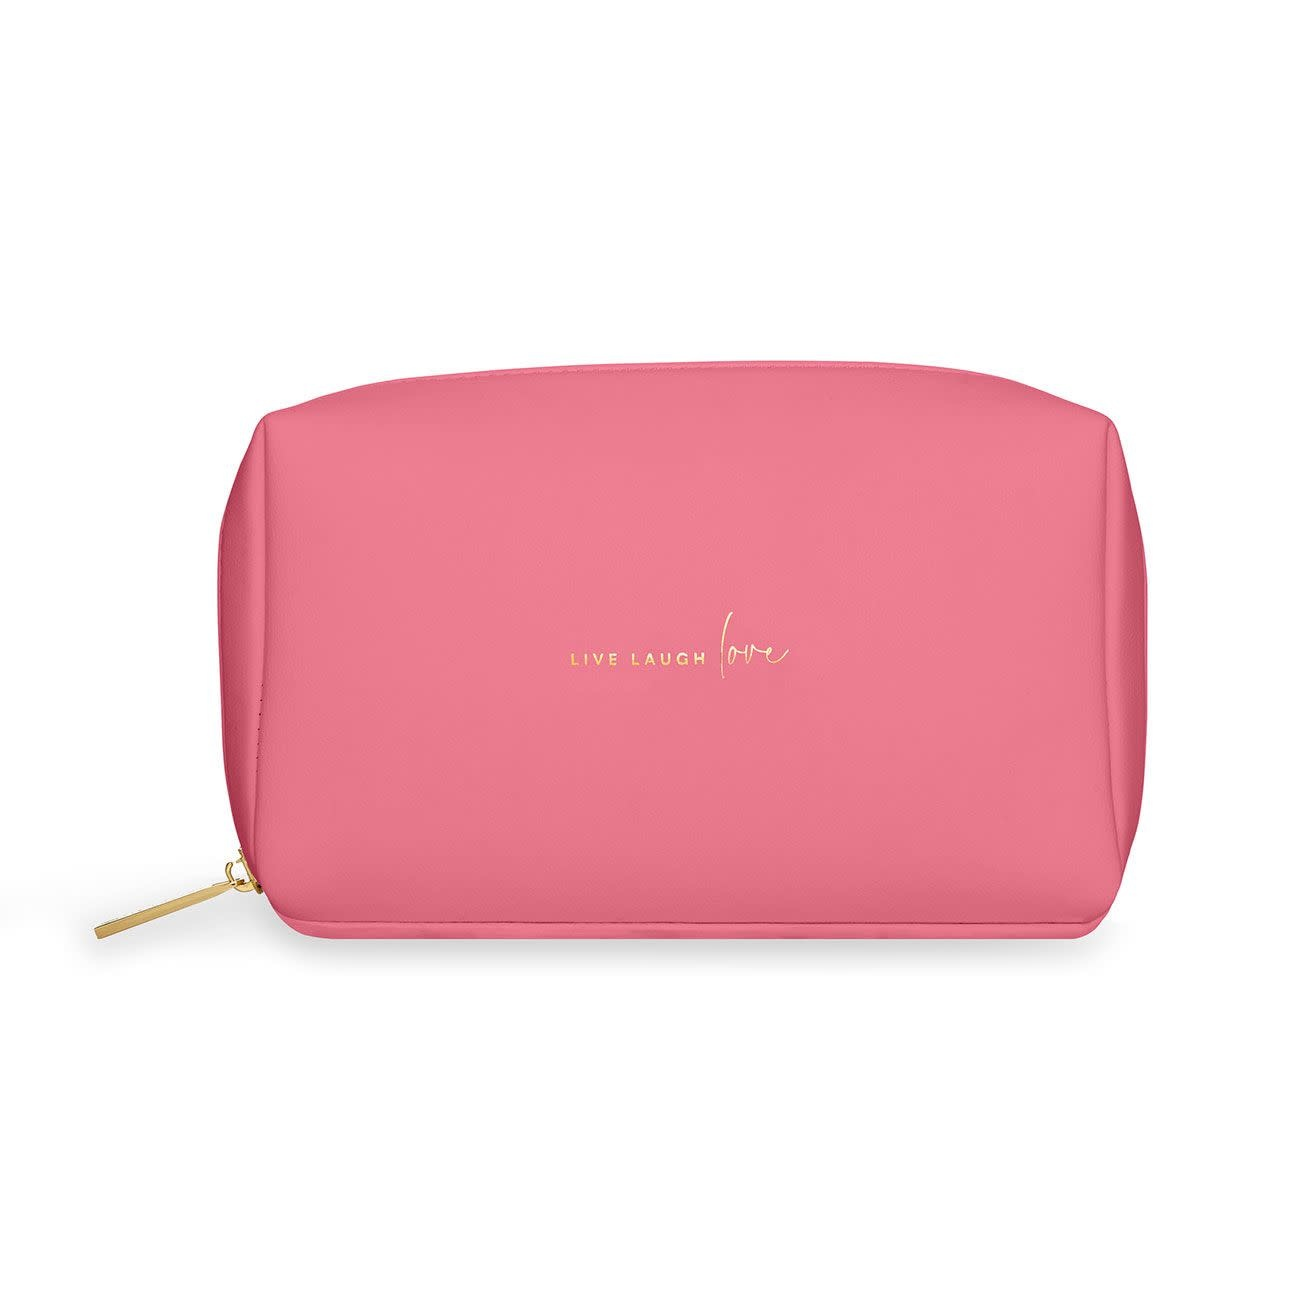 Katie Loxton Katie Loxton make up bag - live love laugh - hot pink 12 x 21 x 7 cm